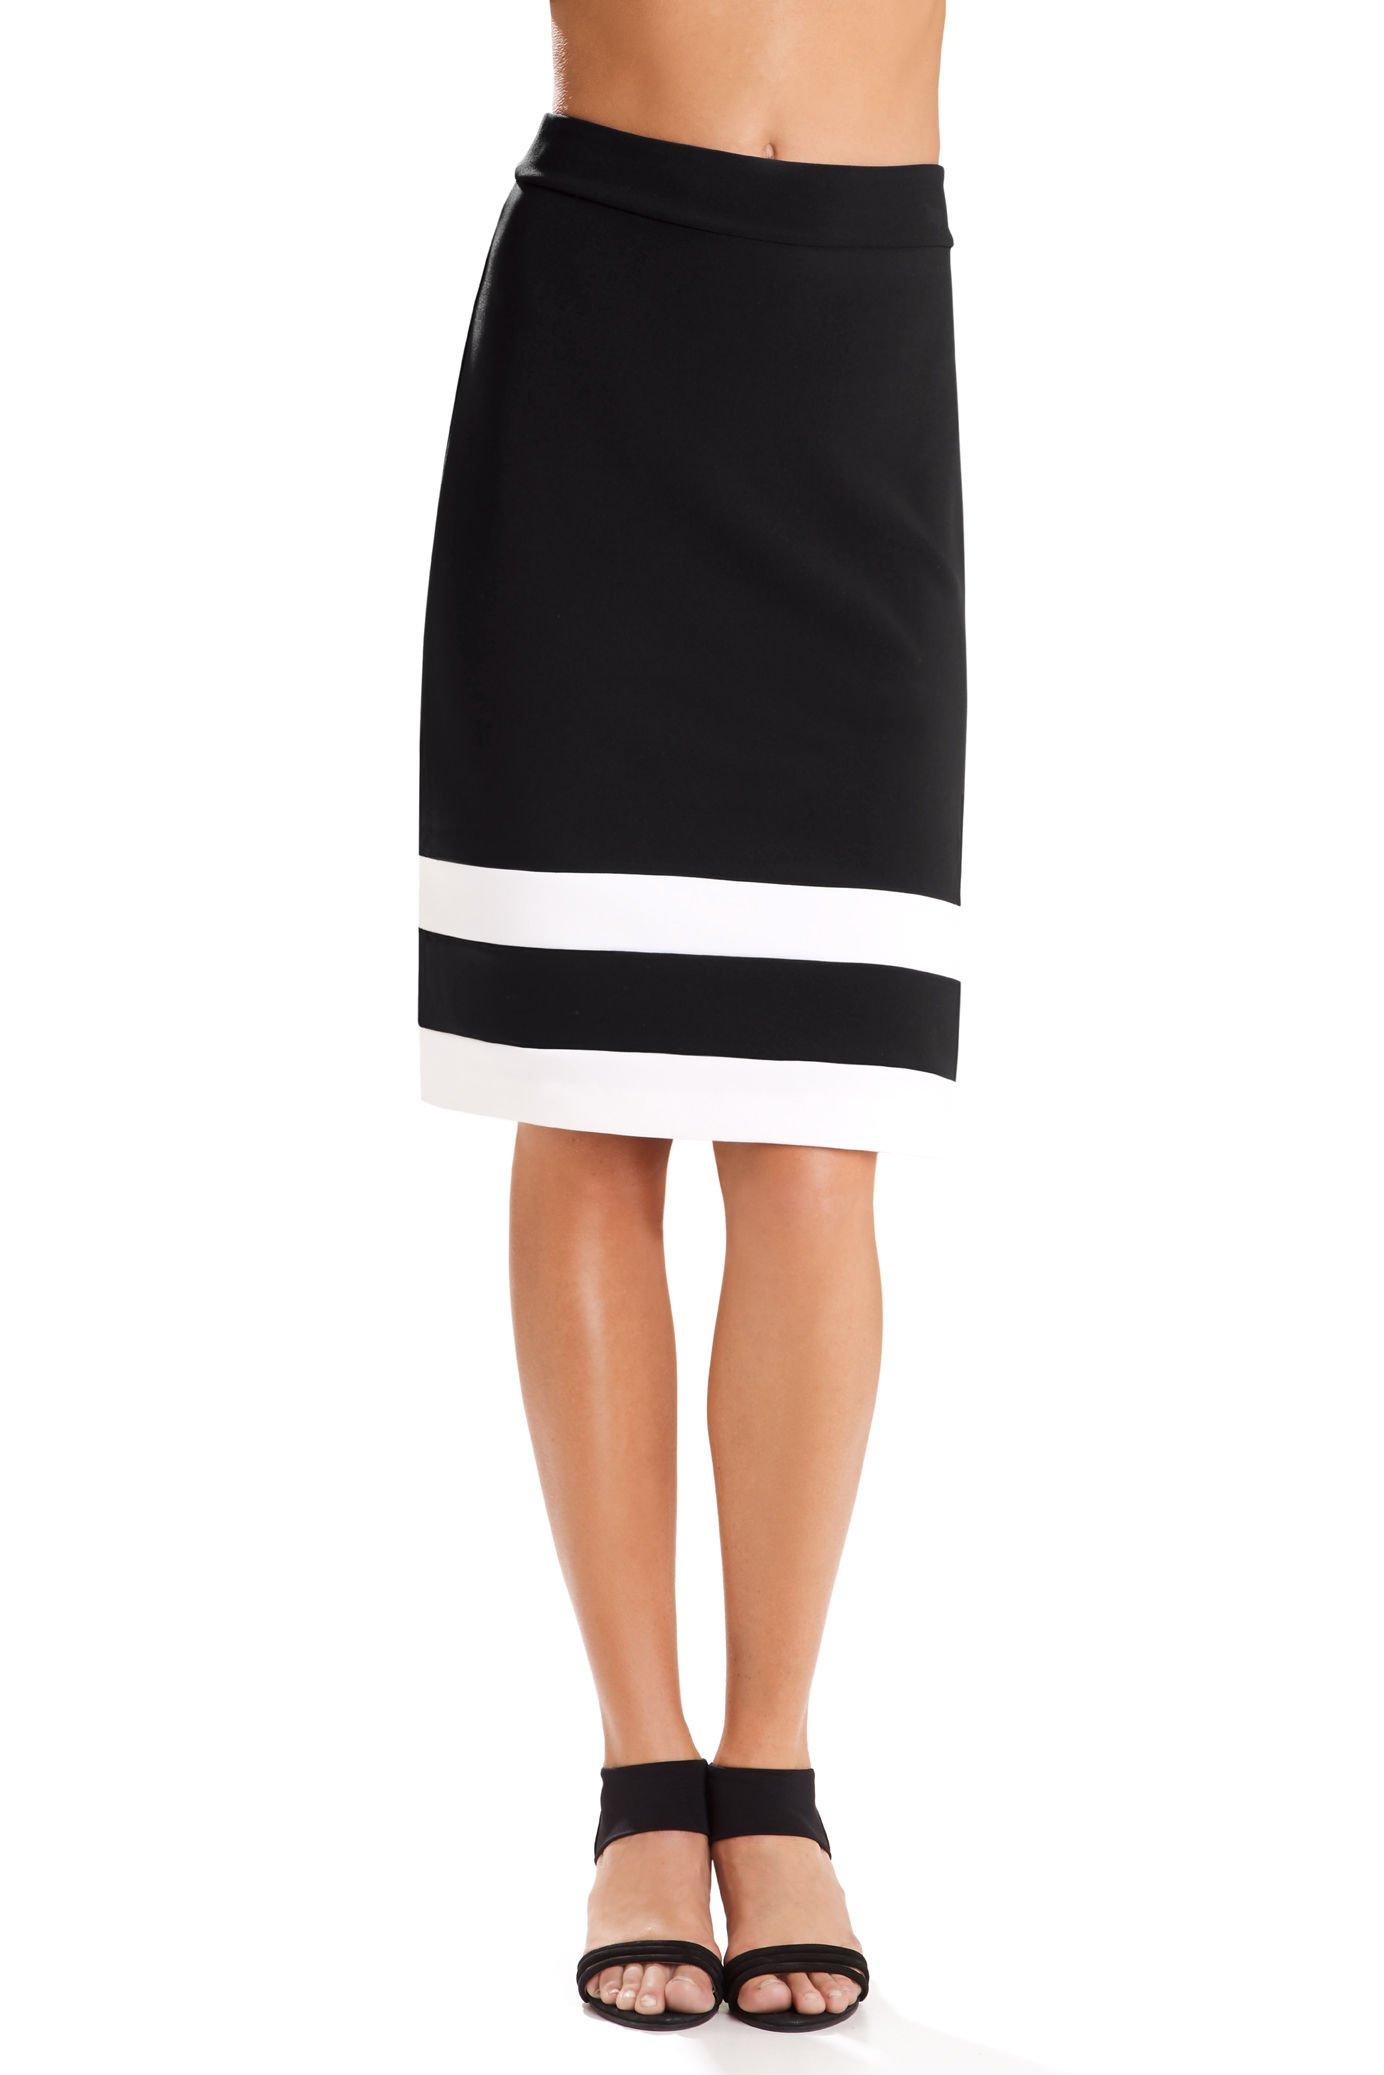 Beyond Travel Women's Wrinkle-Resistant Colorblock Midi Knit Skirt Black/Ivory Coast Large